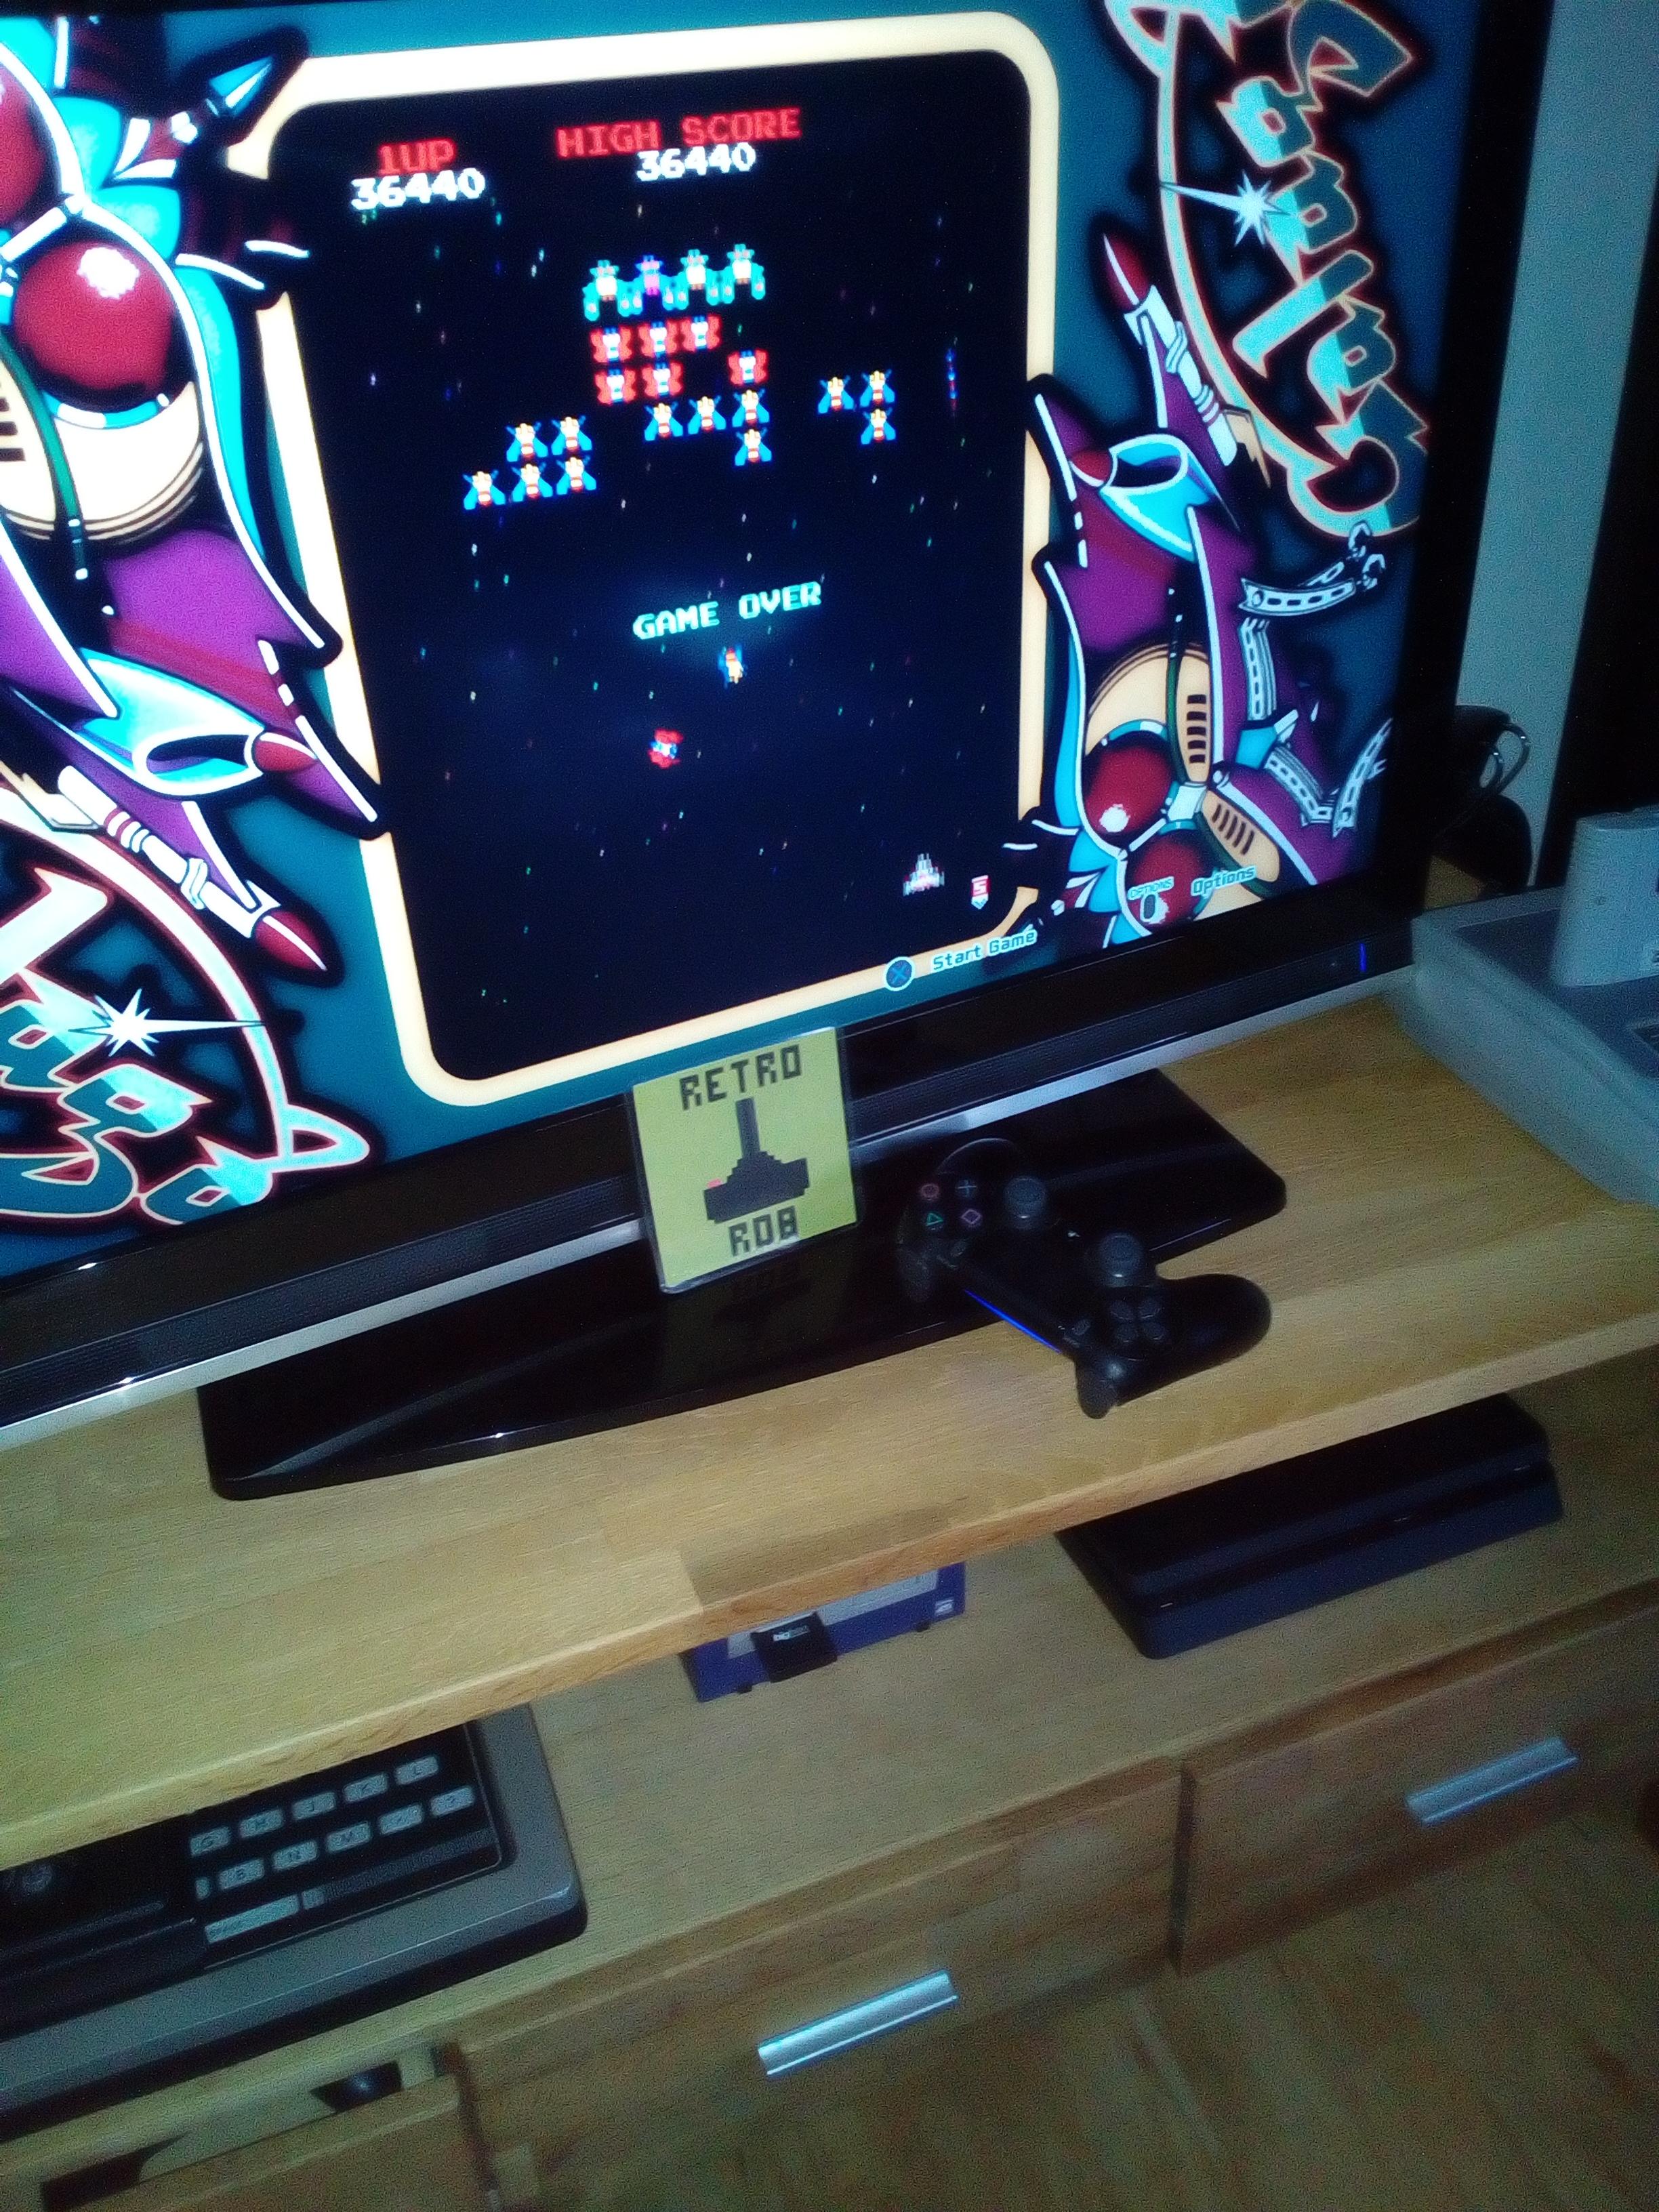 RetroRob: Arcade Game Series: Galaga (Playstation 4) 36,440 points on 2020-07-06 03:29:01